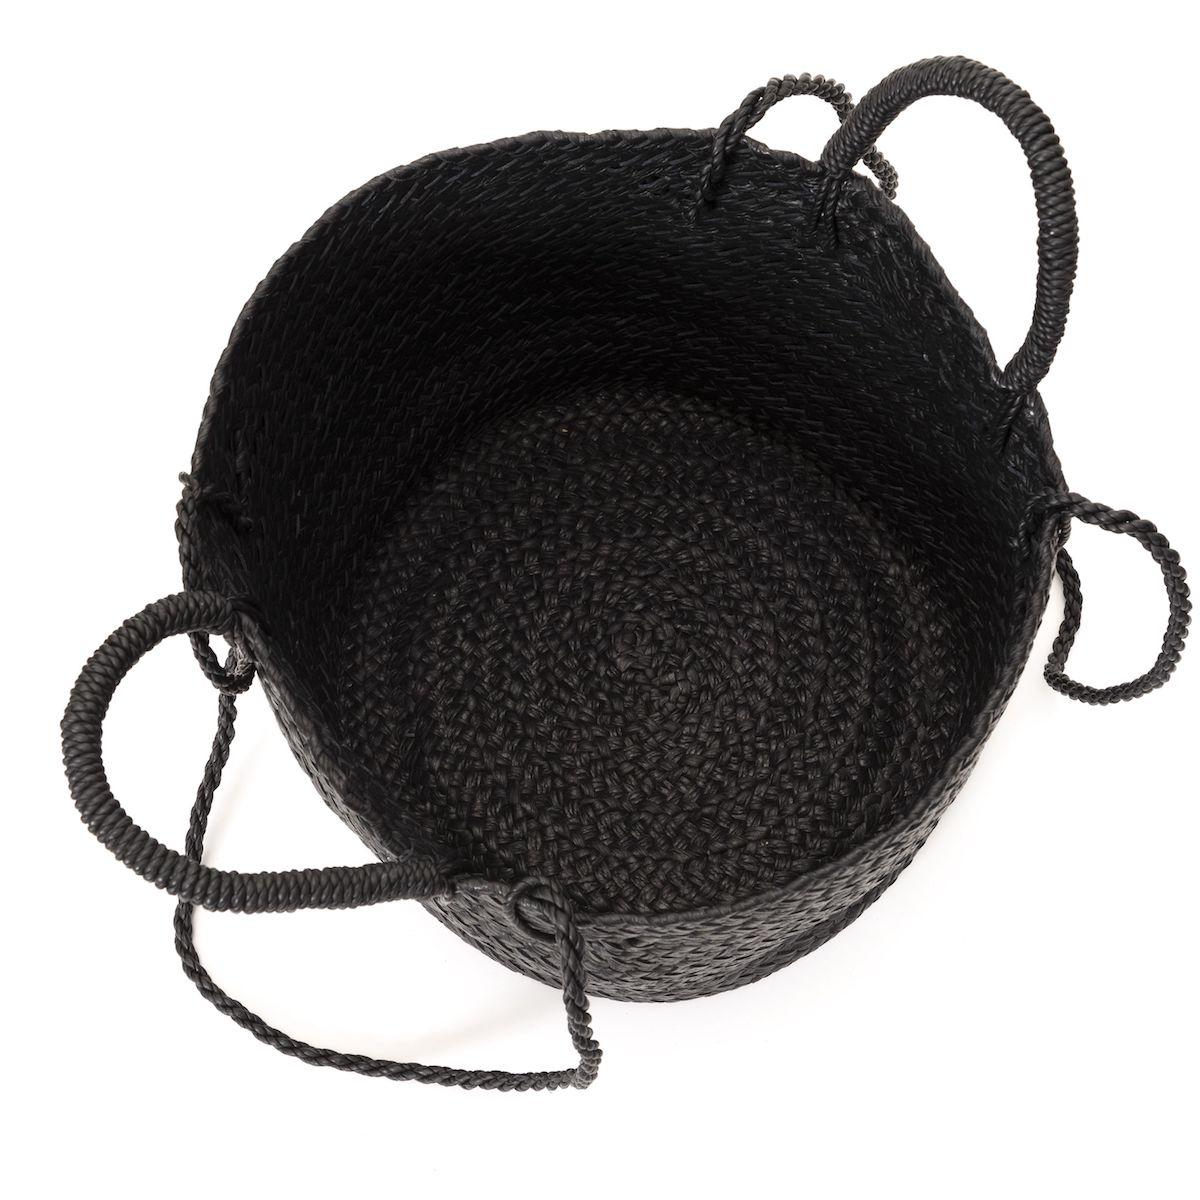 Aeta / LEATHER BASKET M + SHOULDER (Black)収納